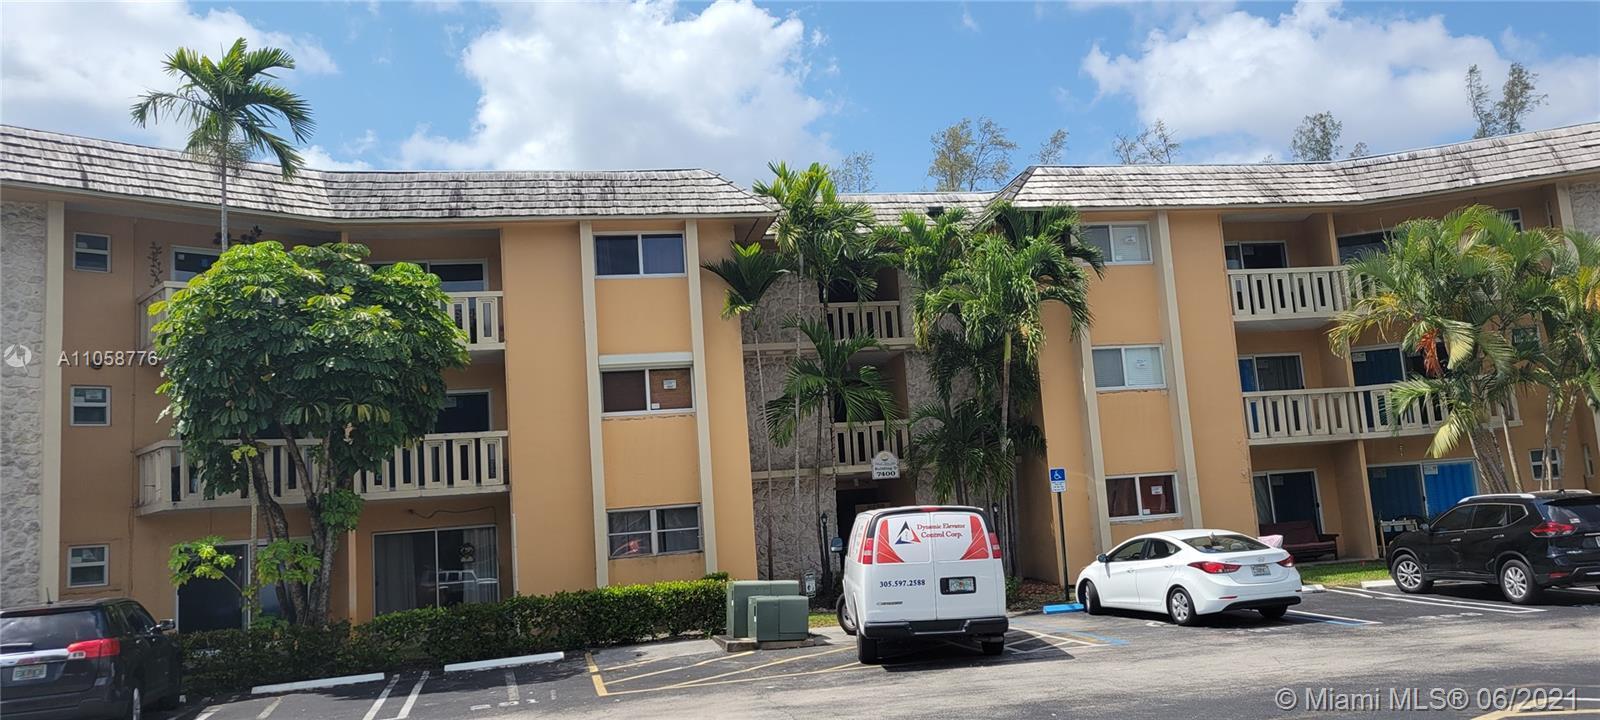 7400  Miami Lakes Dr #D301 For Sale A11058776, FL